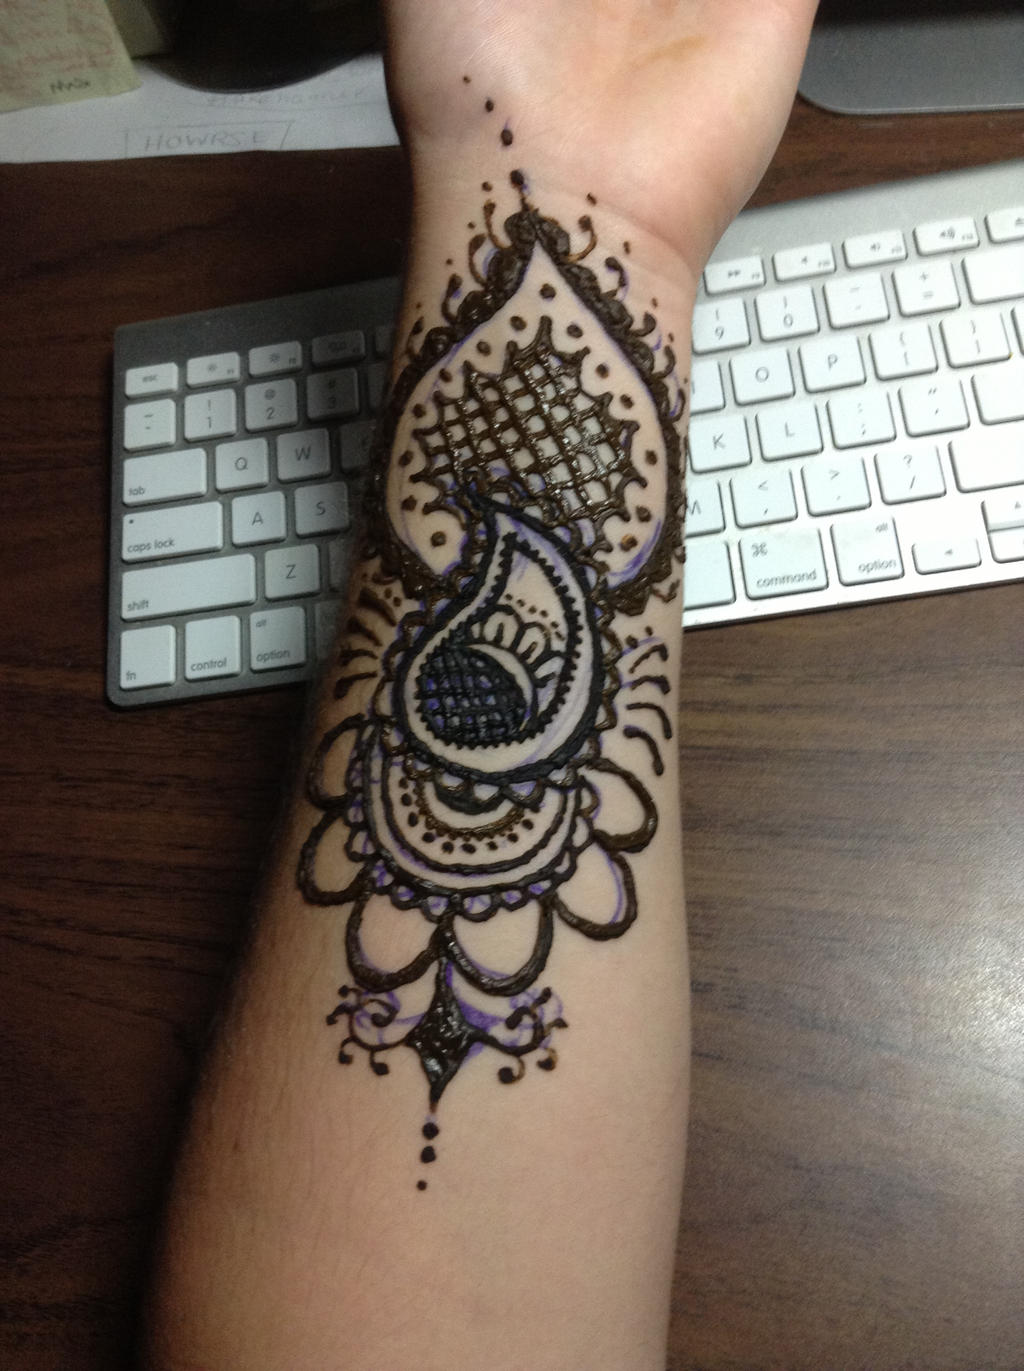 Henna Tattoo Inside Arm: Henna Arm Tattoo By BlackWaterPanther On DeviantArt